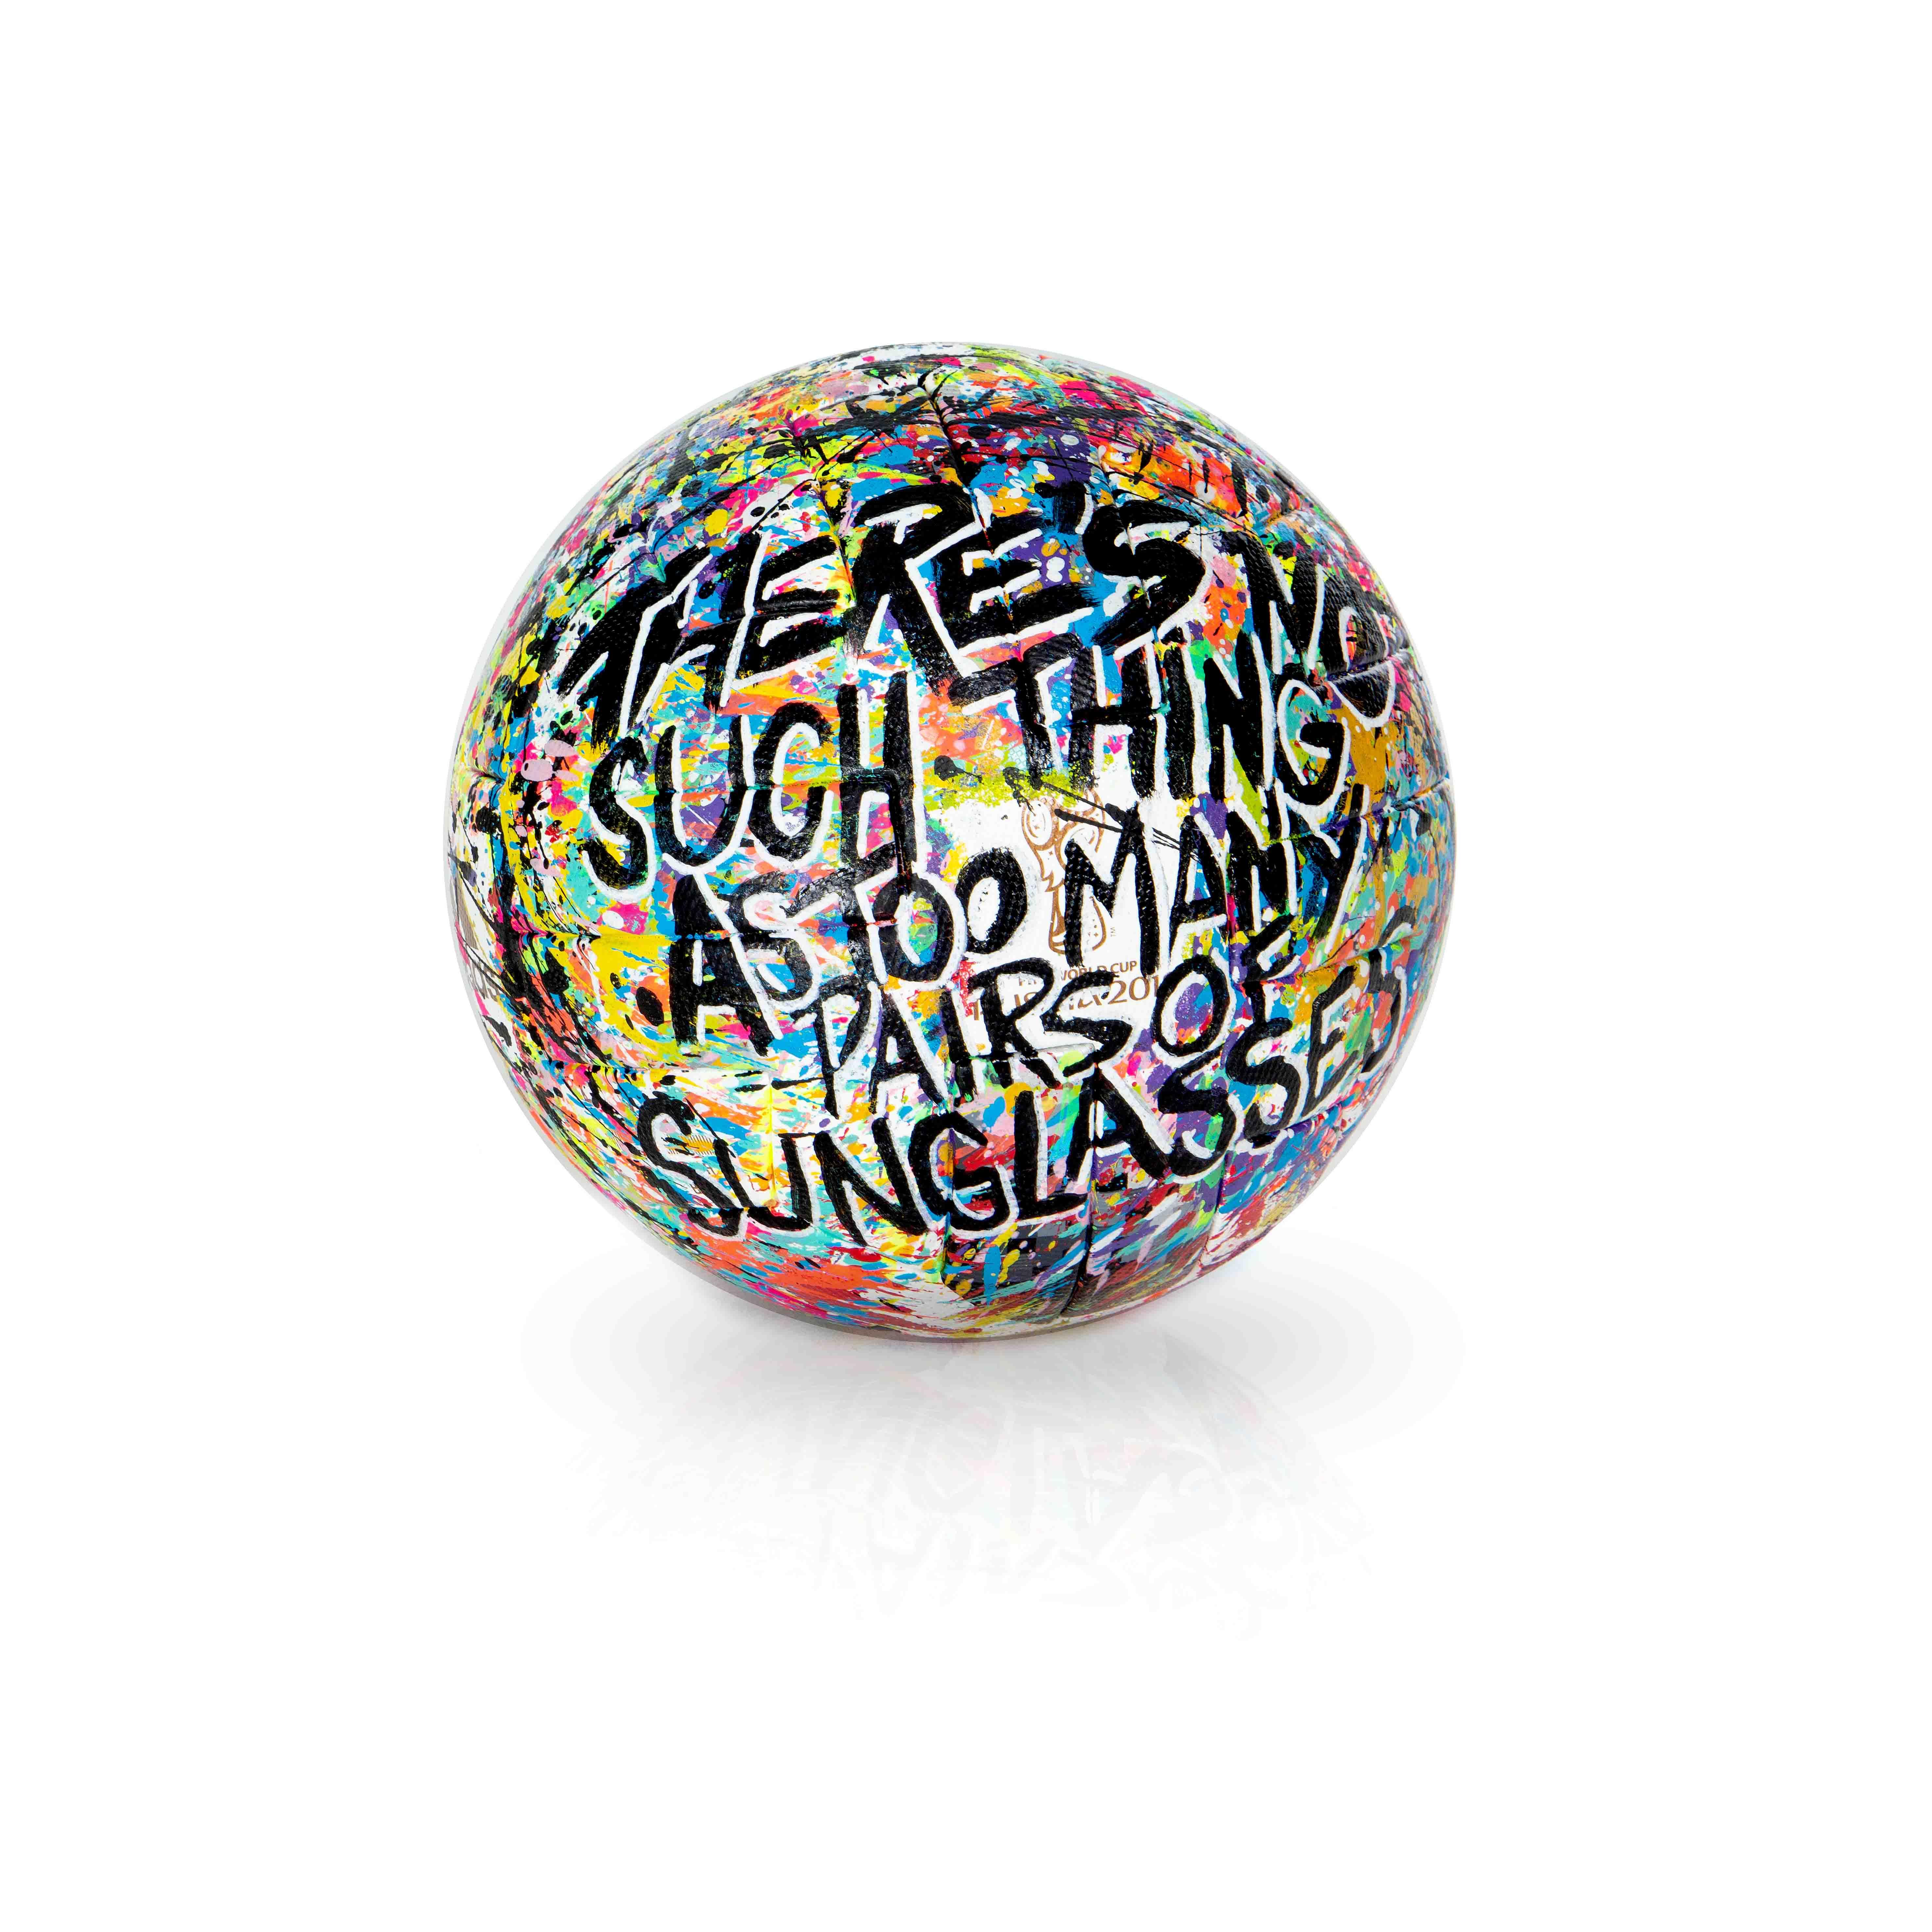 Nk Store lança bolas da Copa customizadas por personalidades